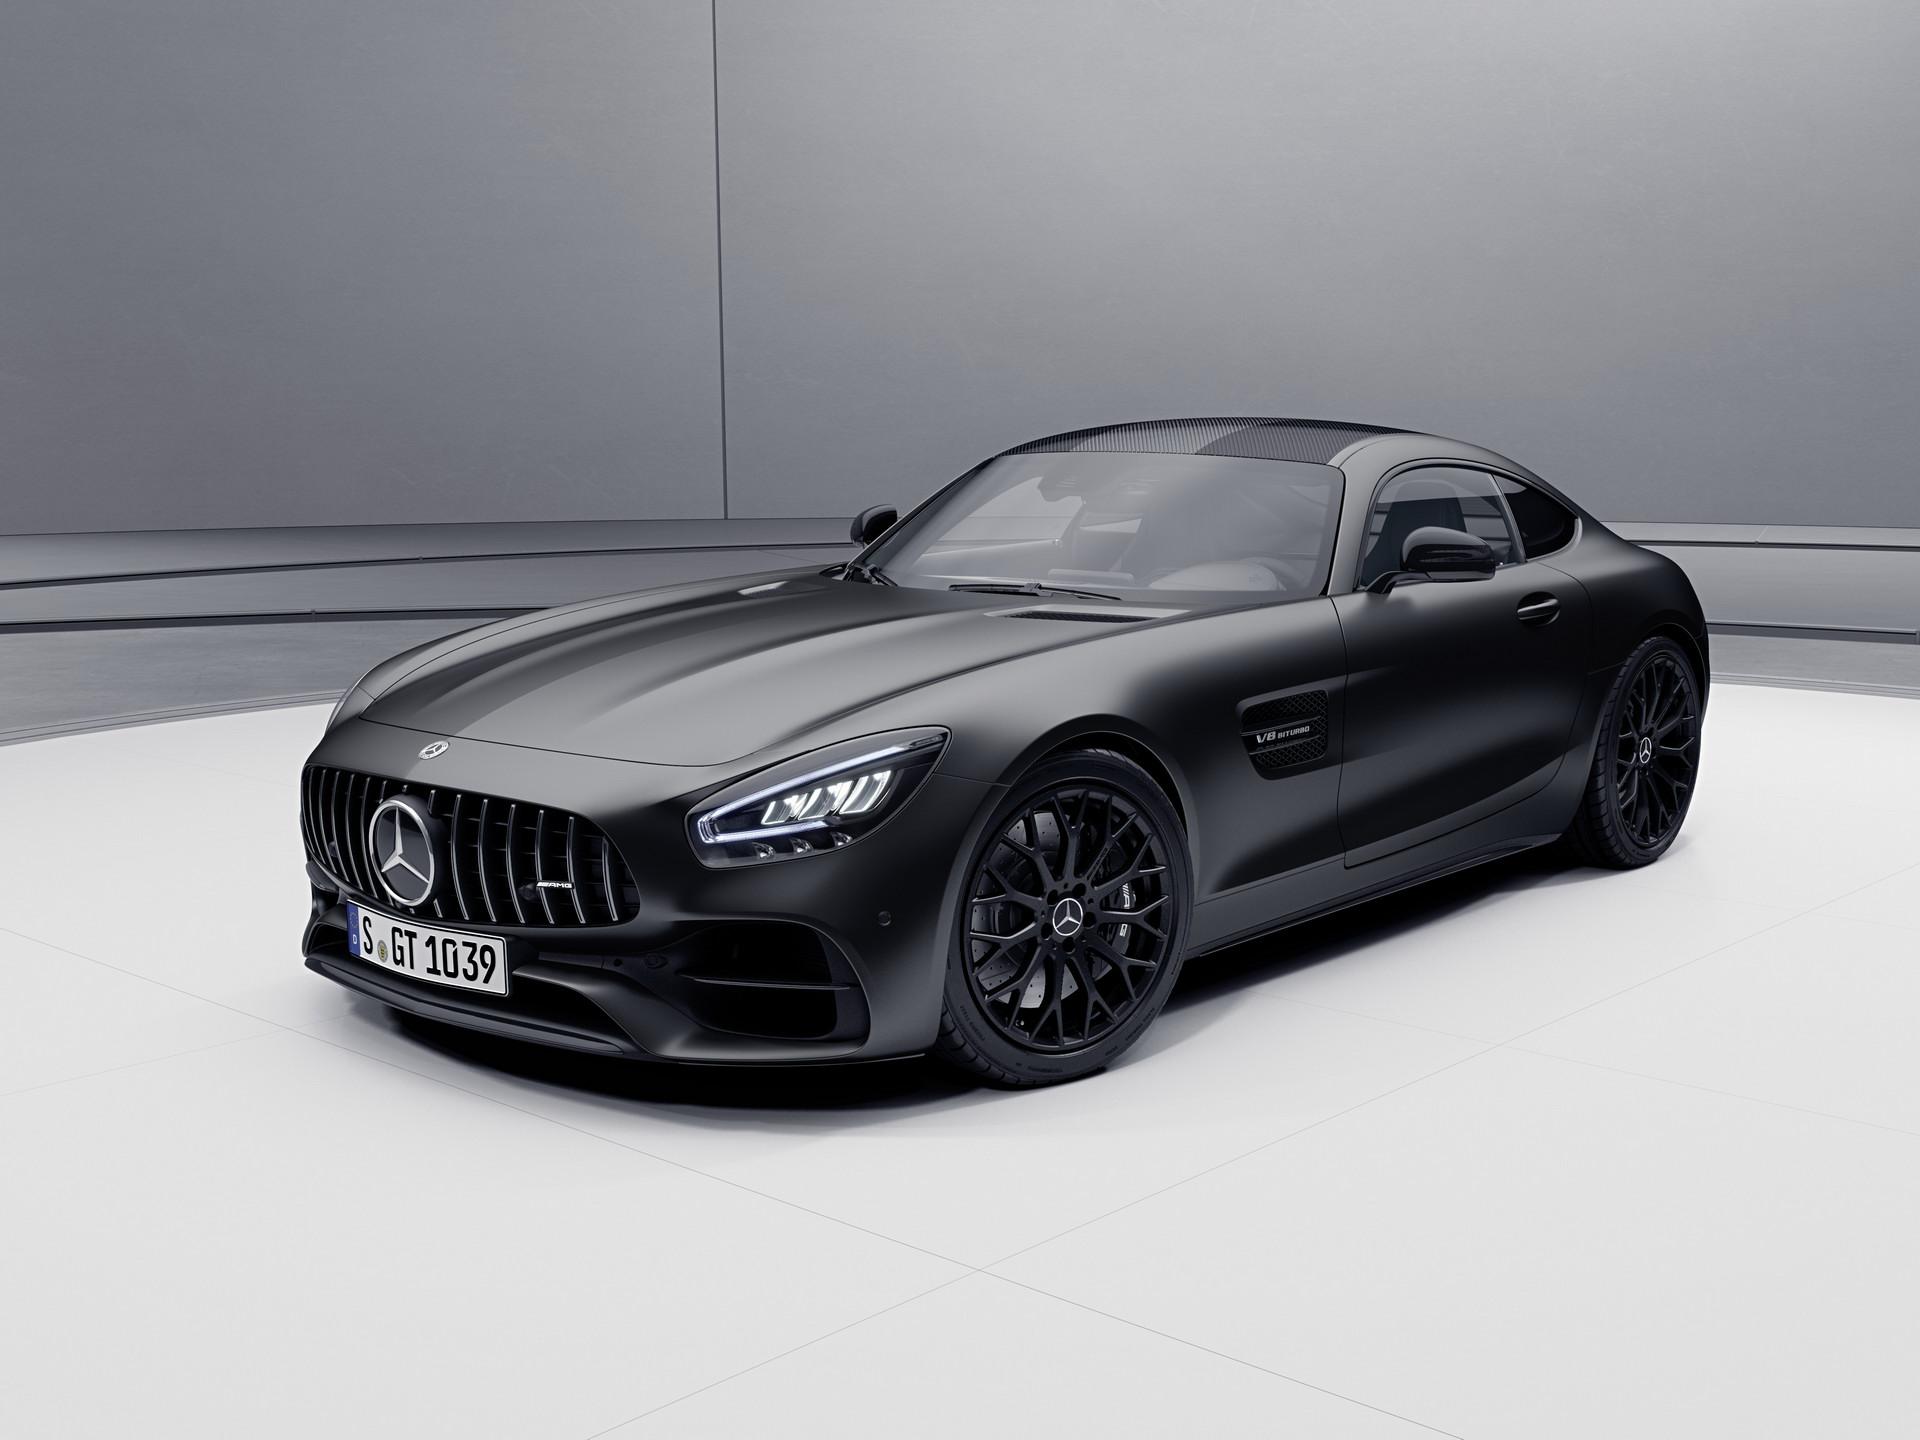 Mercedes Amg Gt Coupe Australia (2)